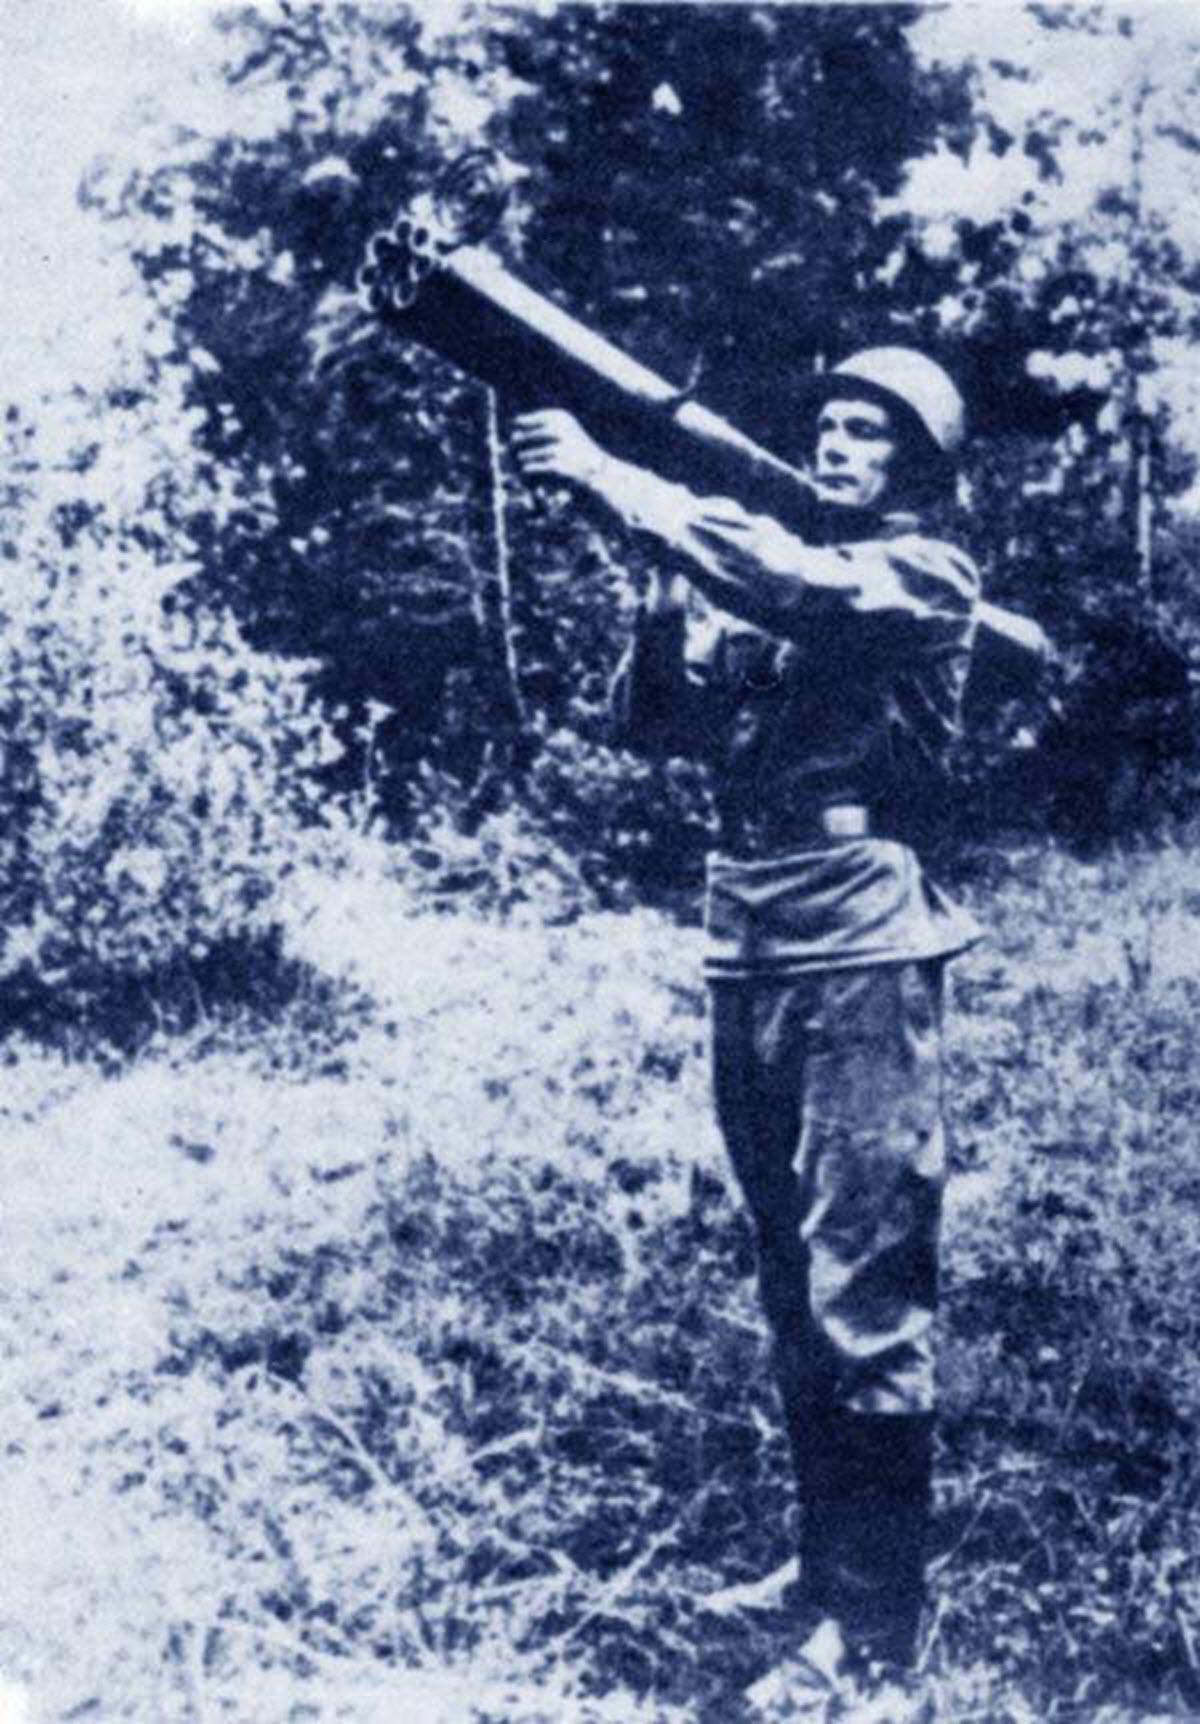 https://war-time.ru/images/blog/strelkovoe-orujie/pzrk/rossiya/kolos/dop/pzrk-kolos.jpg